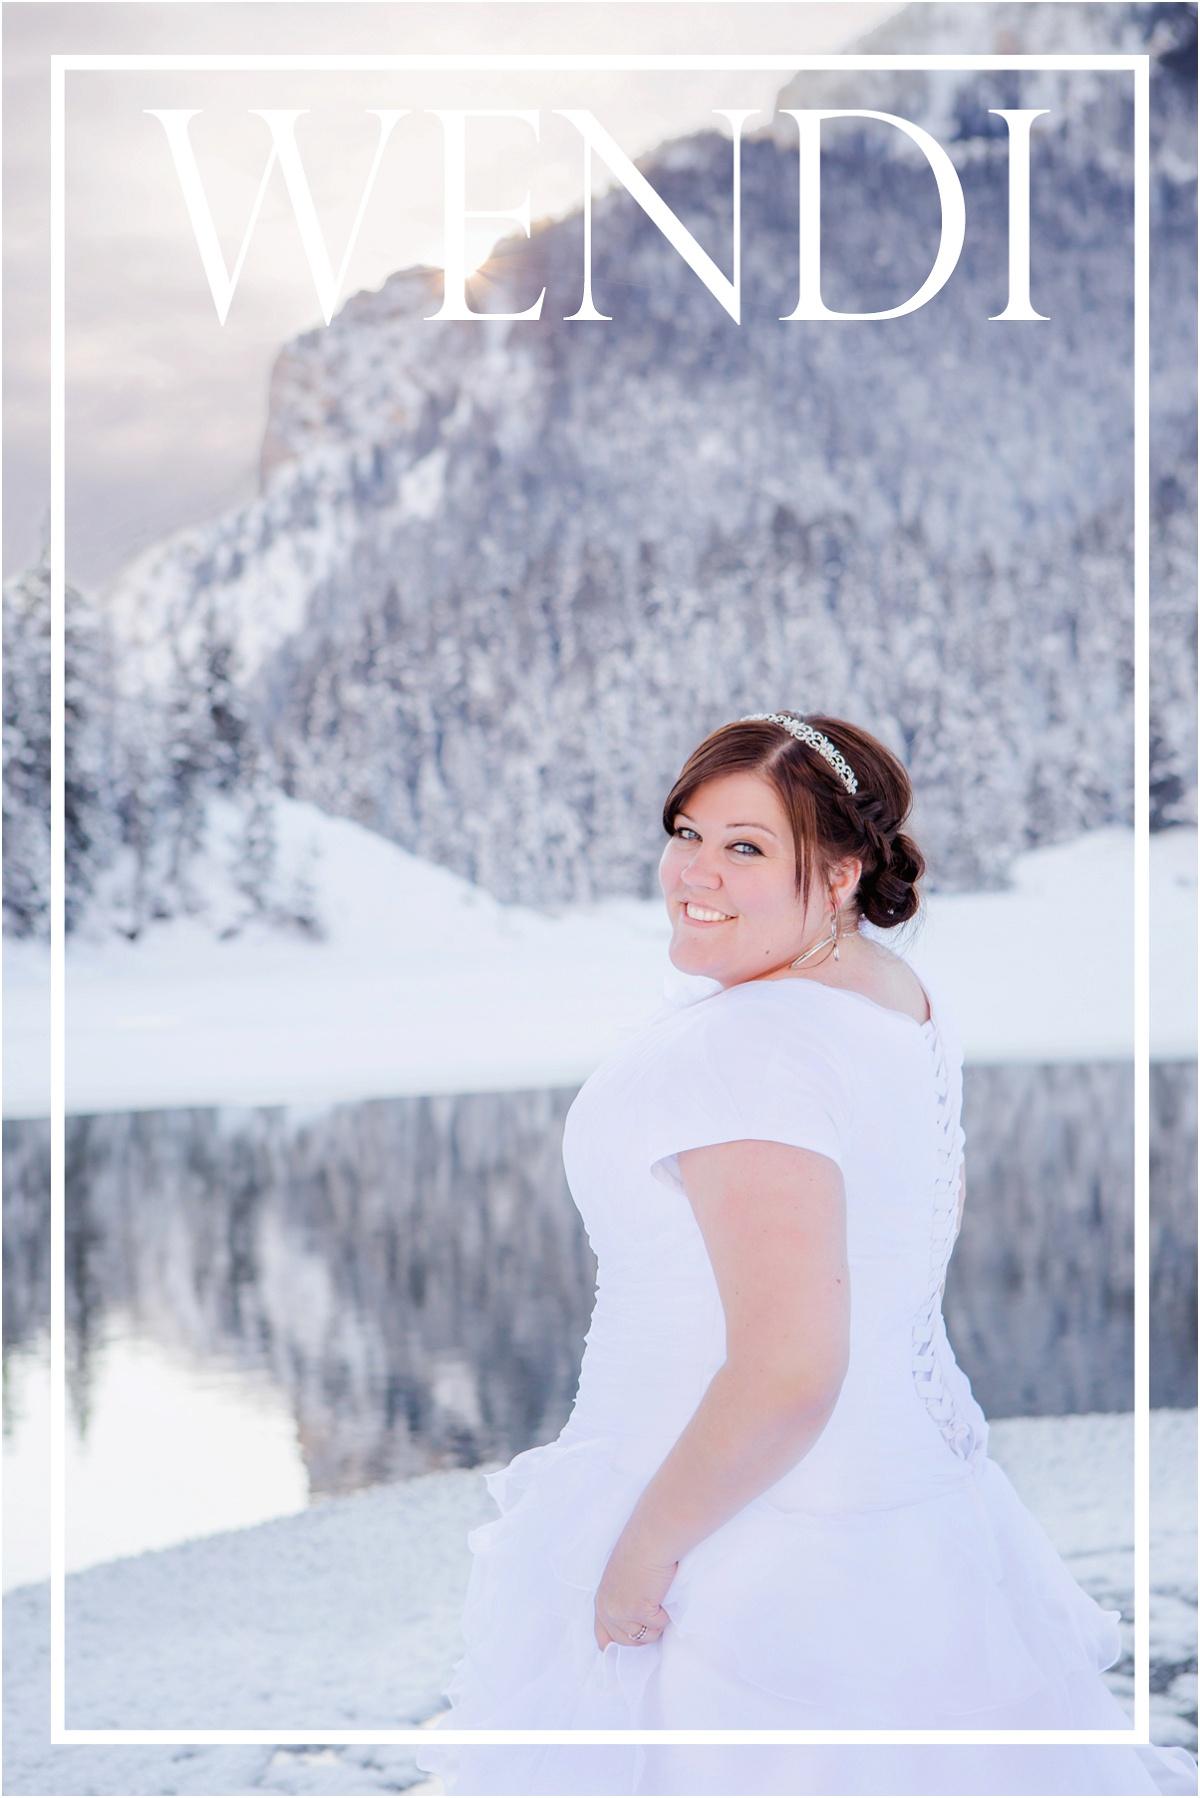 Terra Cooper Photography Weddings Brides 2015_5397.jpg